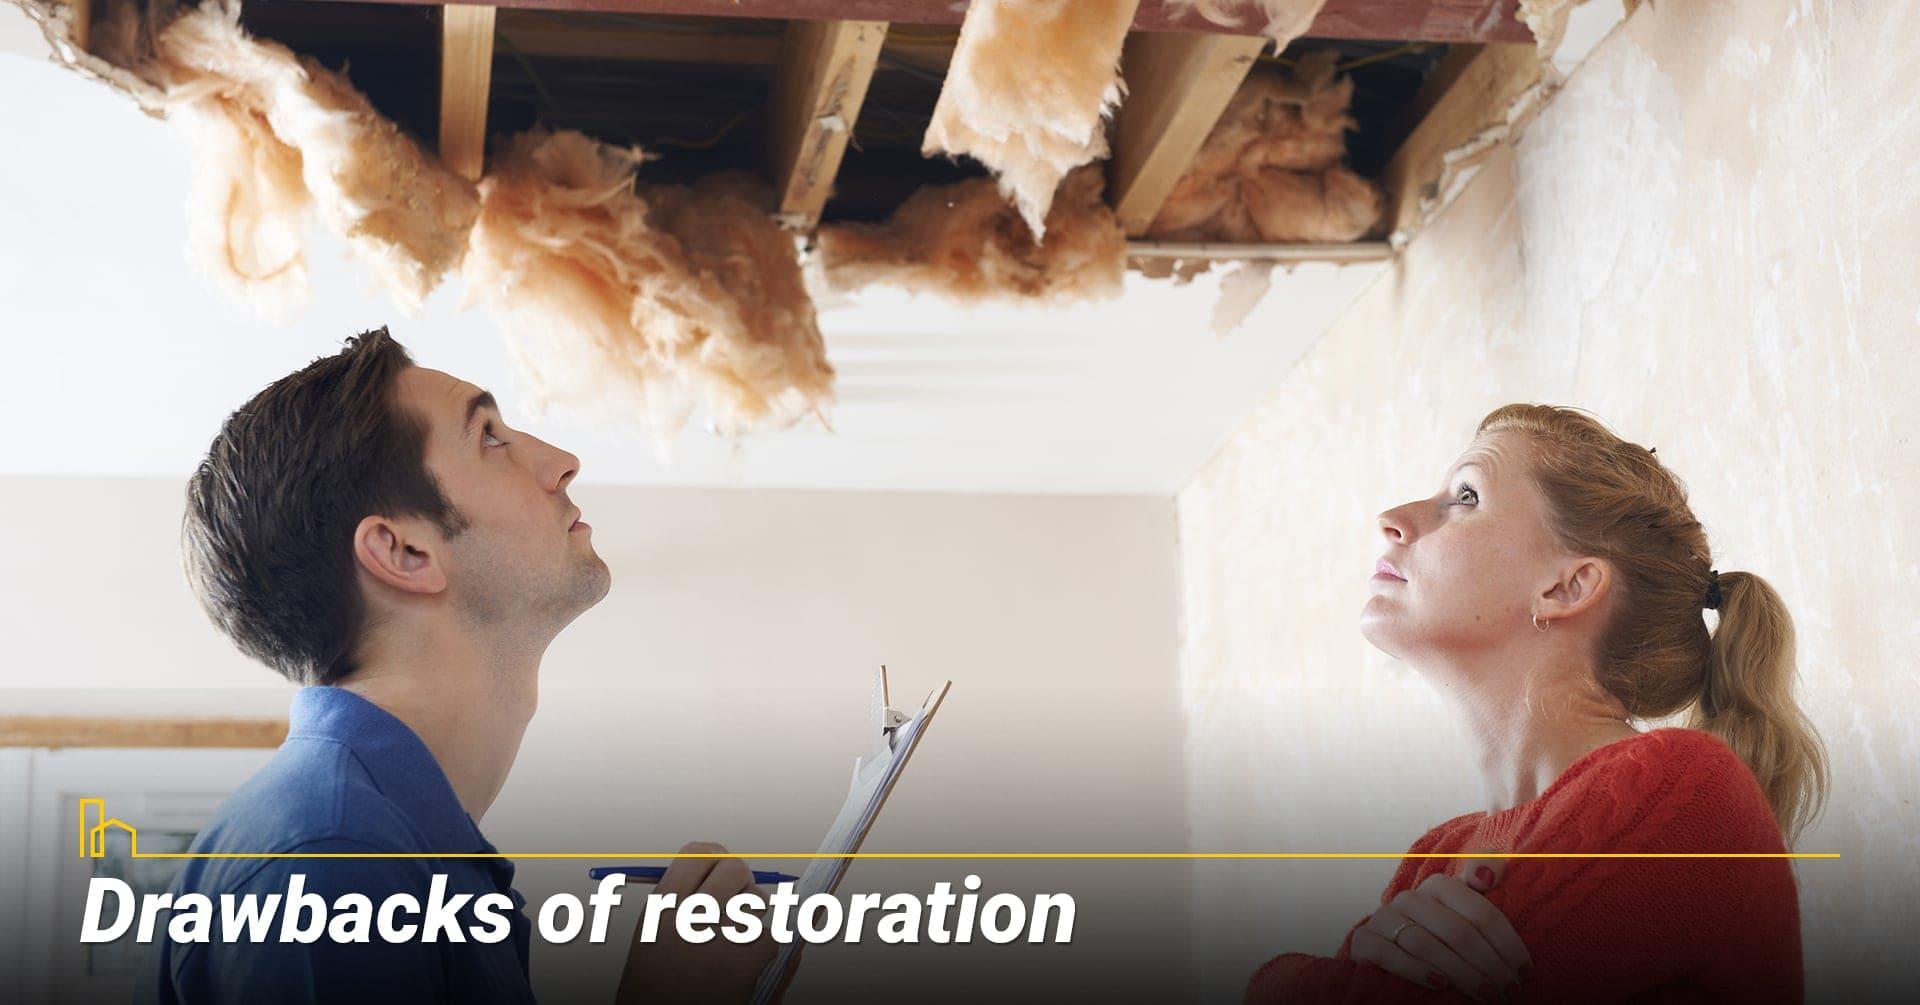 Drawbacks of restoration, the disadvantages of roof restoration